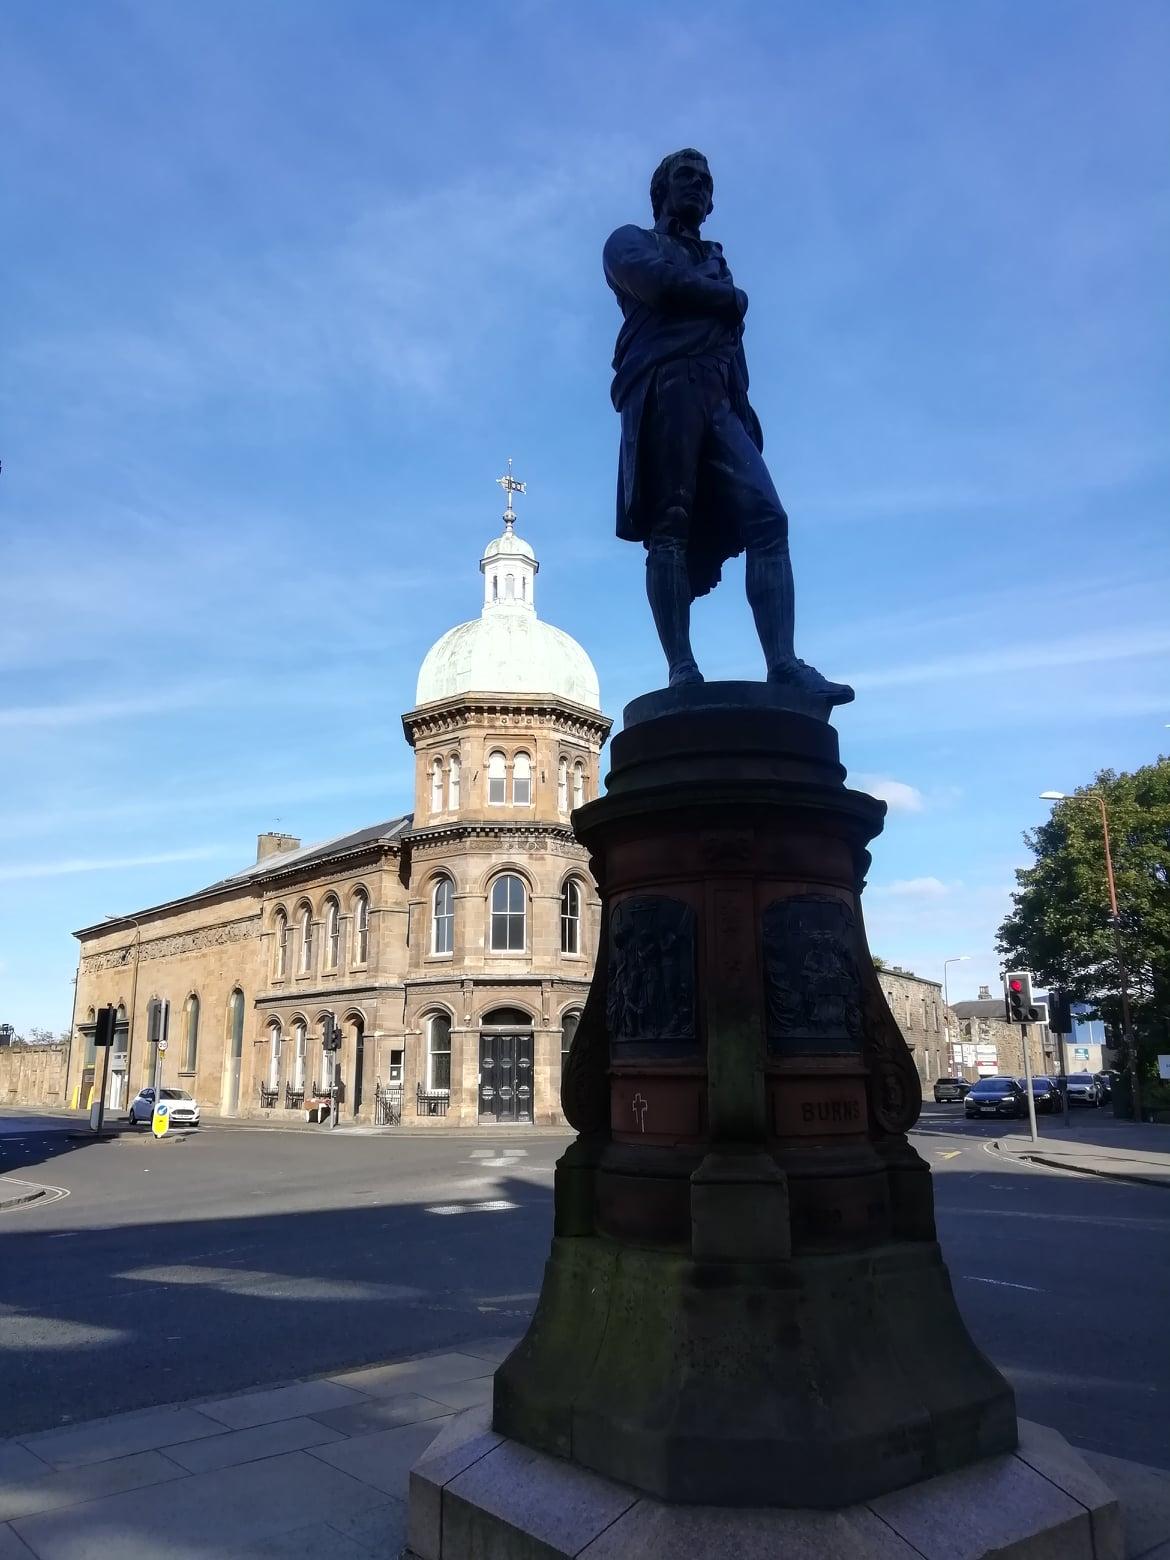 Burns Statue, Constitution Street, Leith